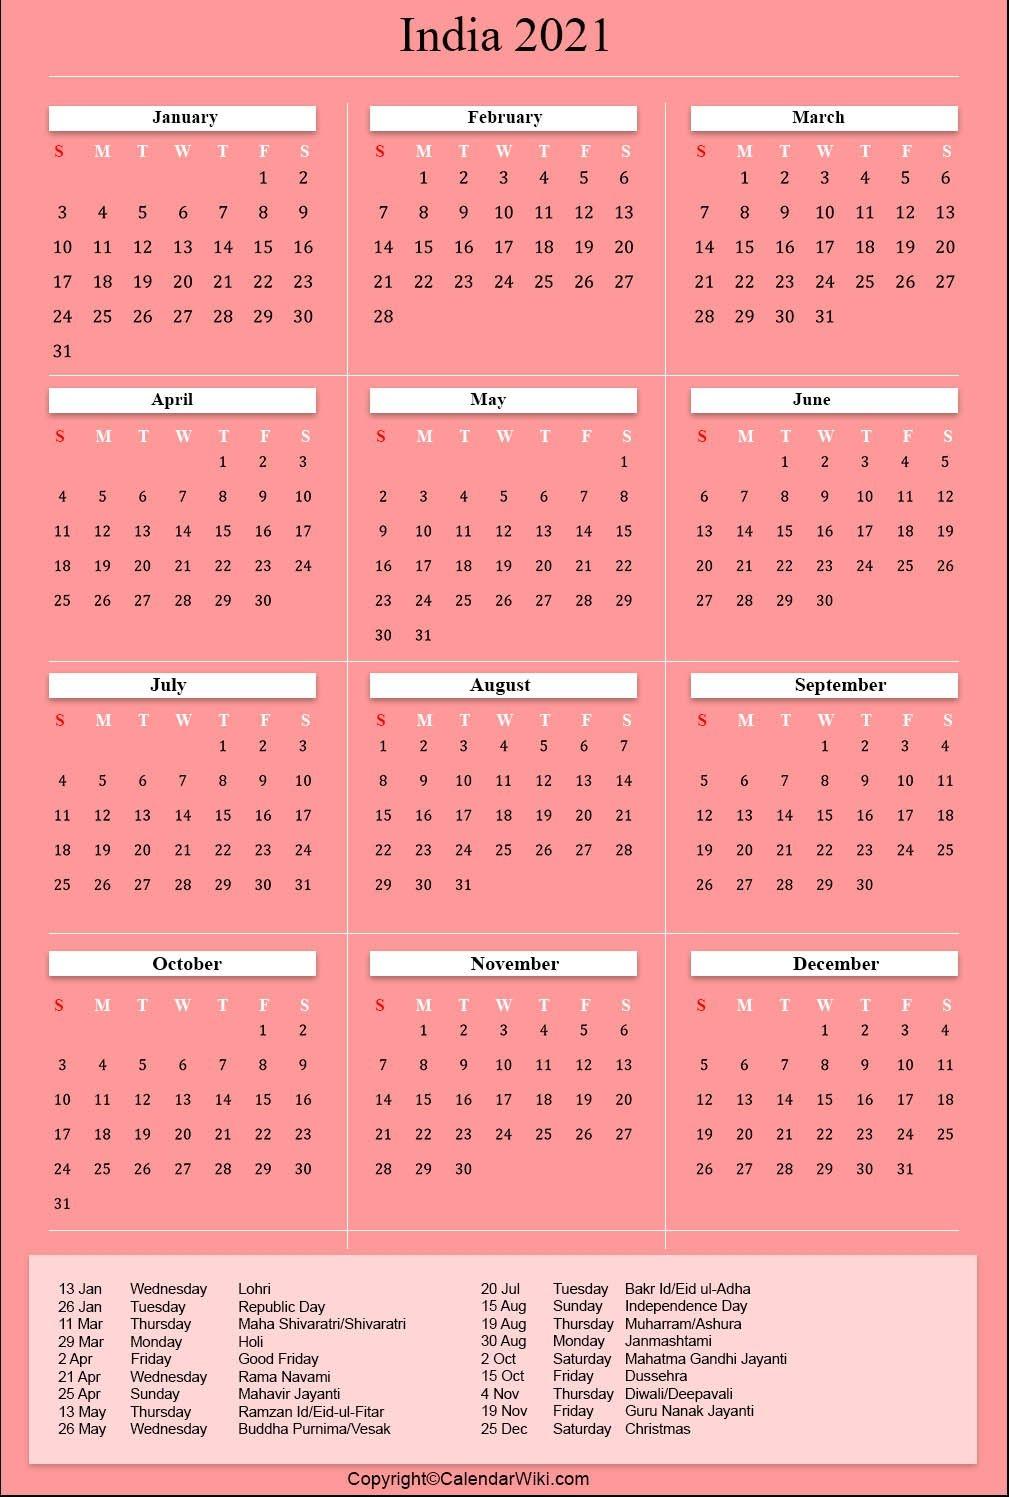 Printable India Calendar 2021 With Holidays [Public Holidays]